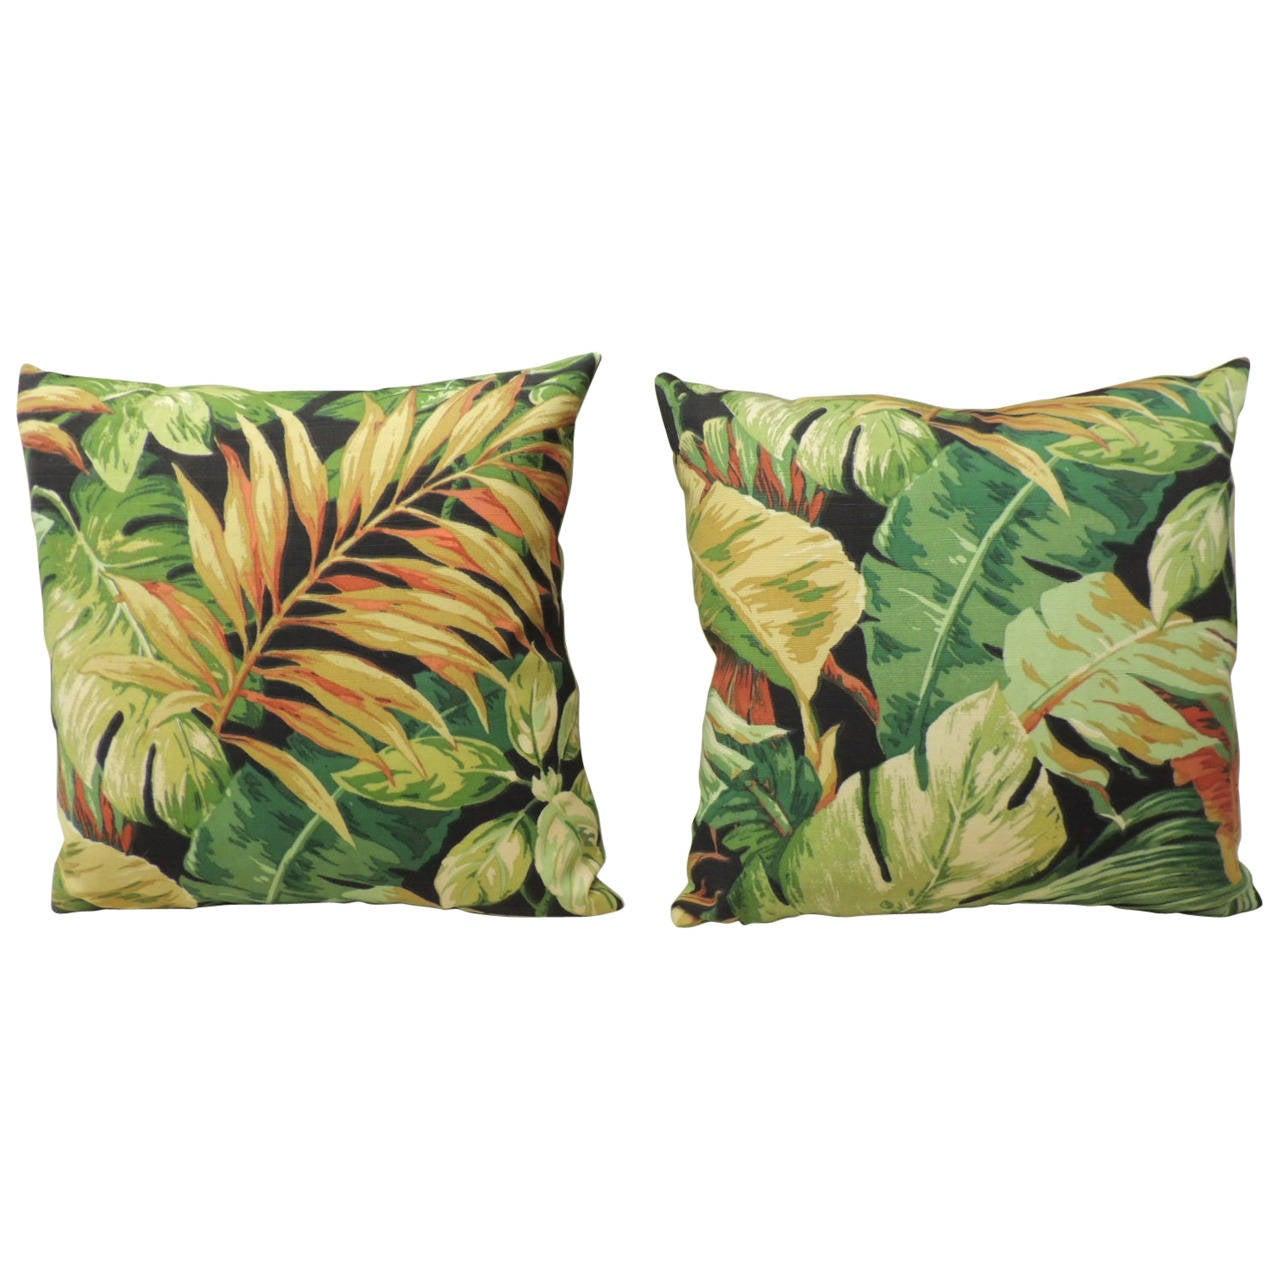 Pair of Green Tropical Leaf Barkcloth Decorative Pillows